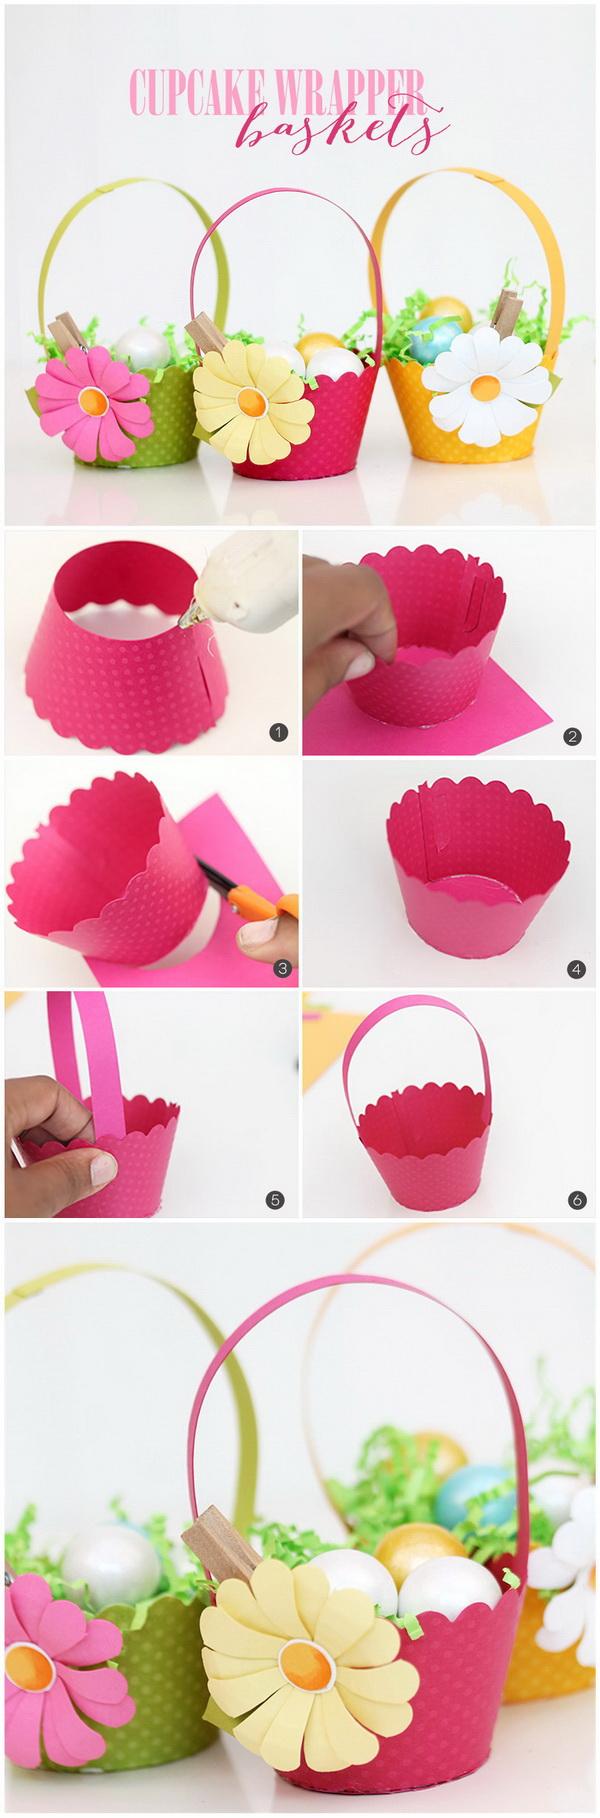 DIY Easter Decoration Ideas: DIY Cupcake Wrapper Easter Baskets.